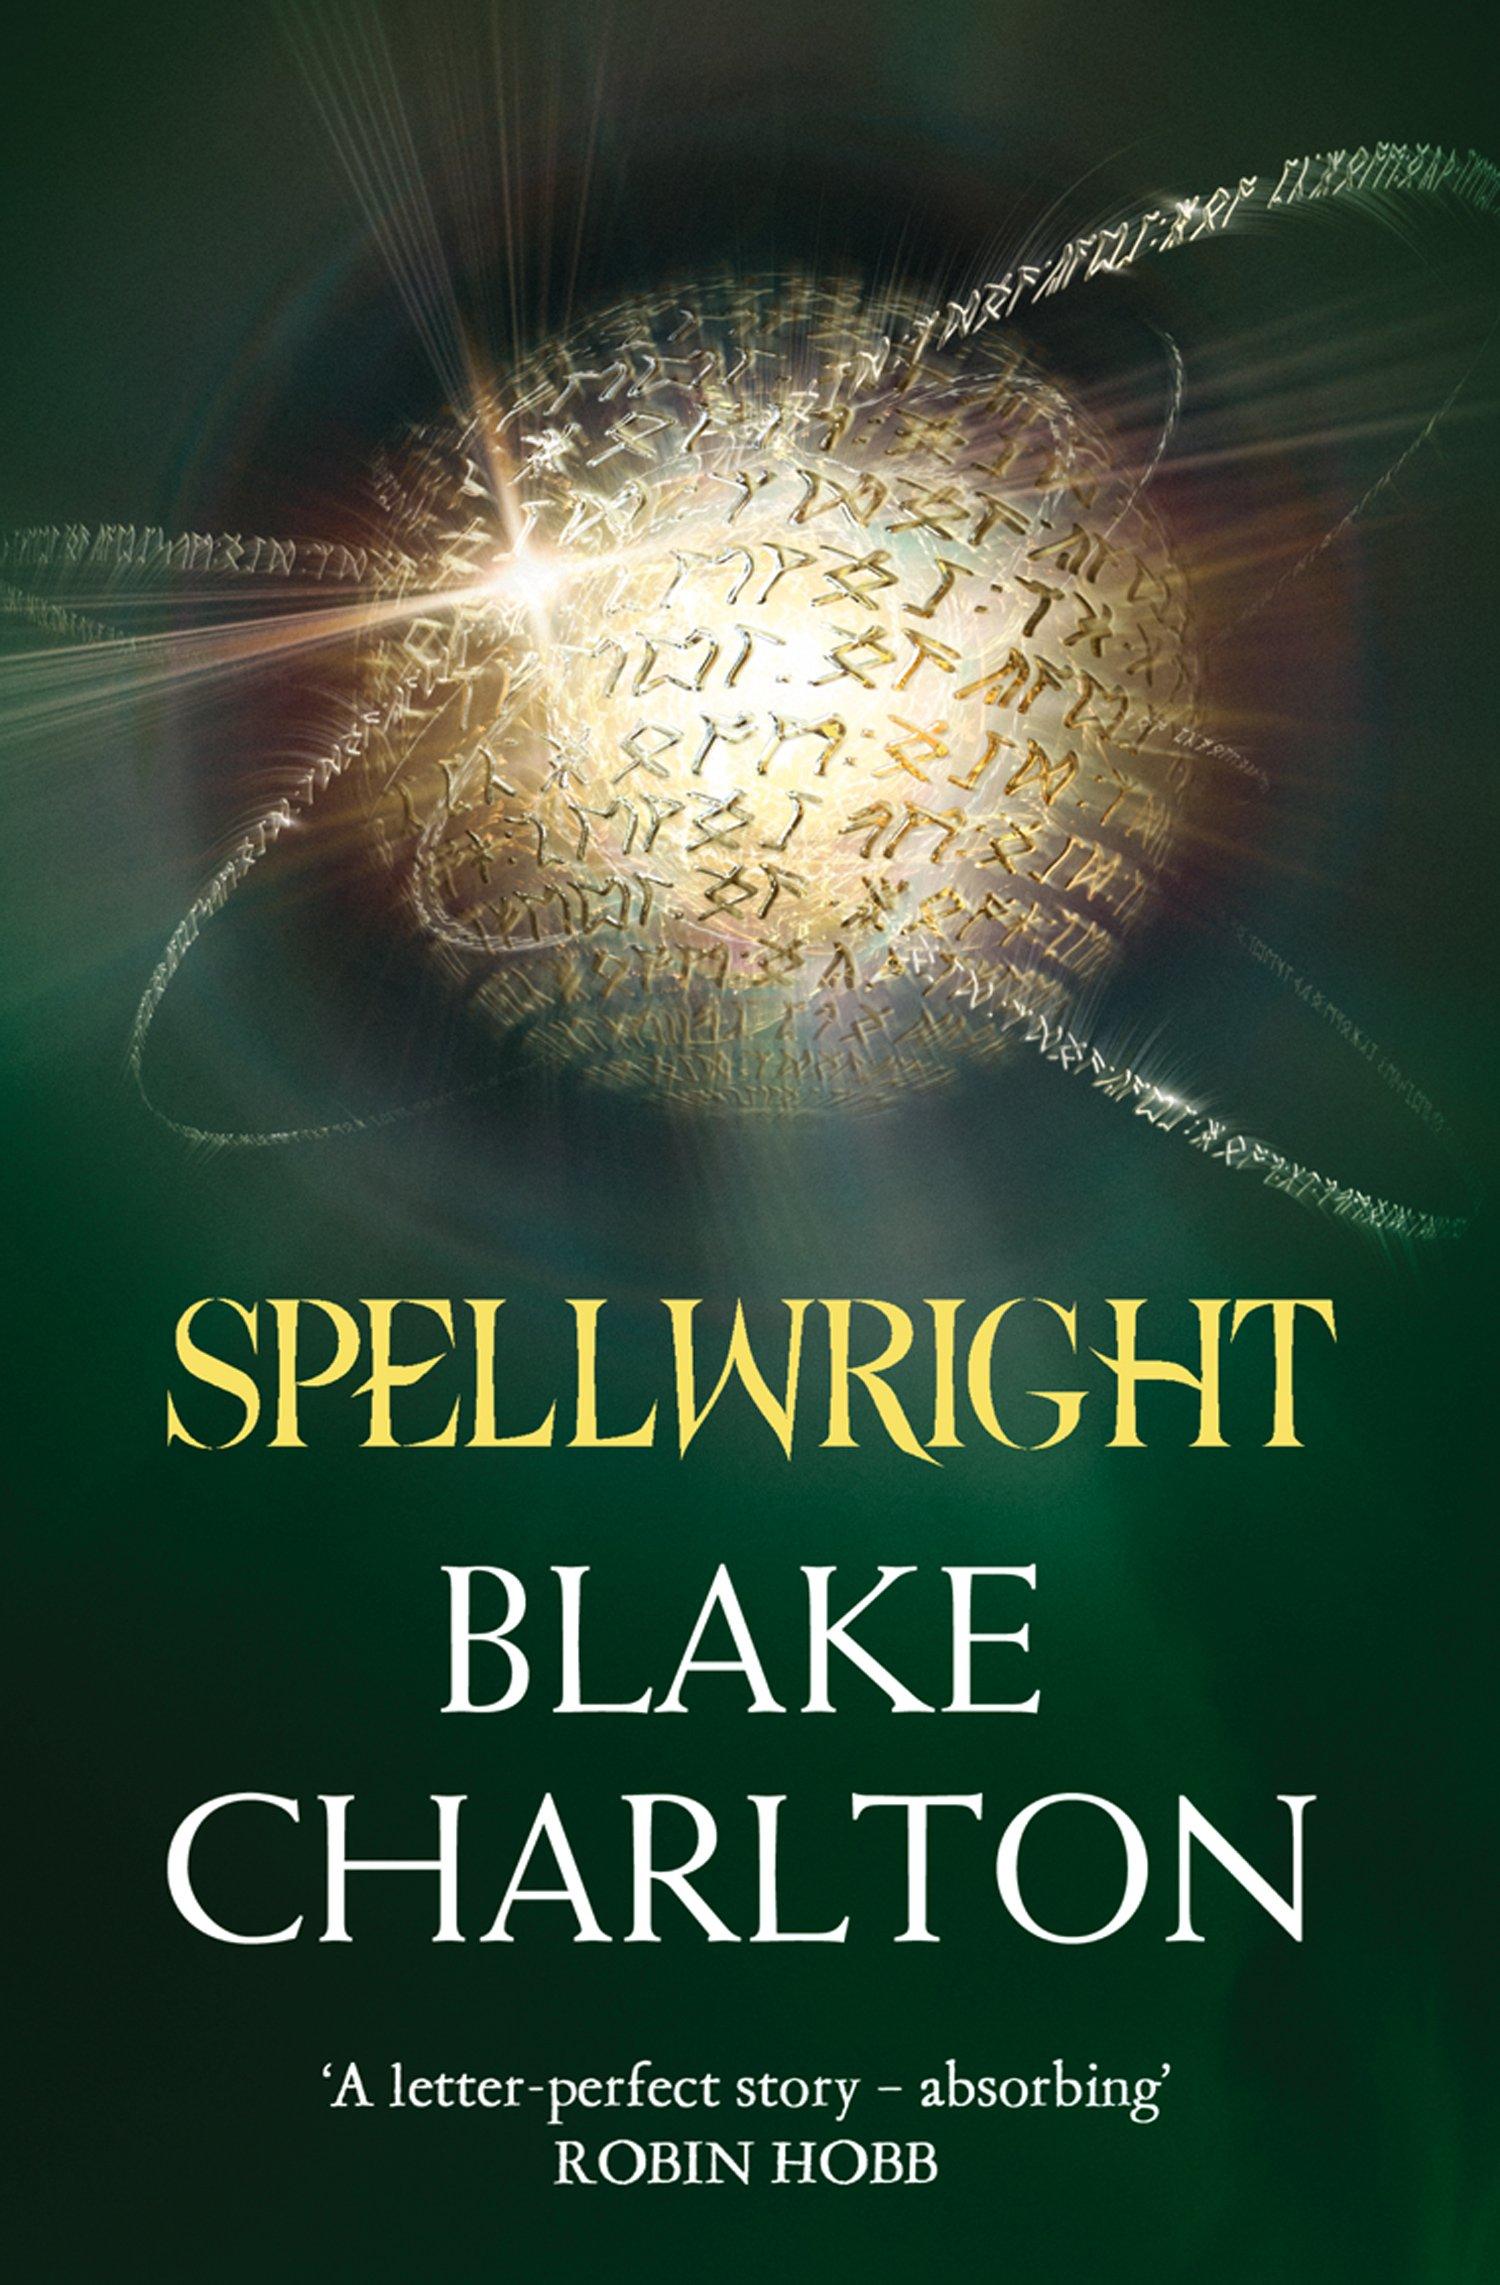 spellwright